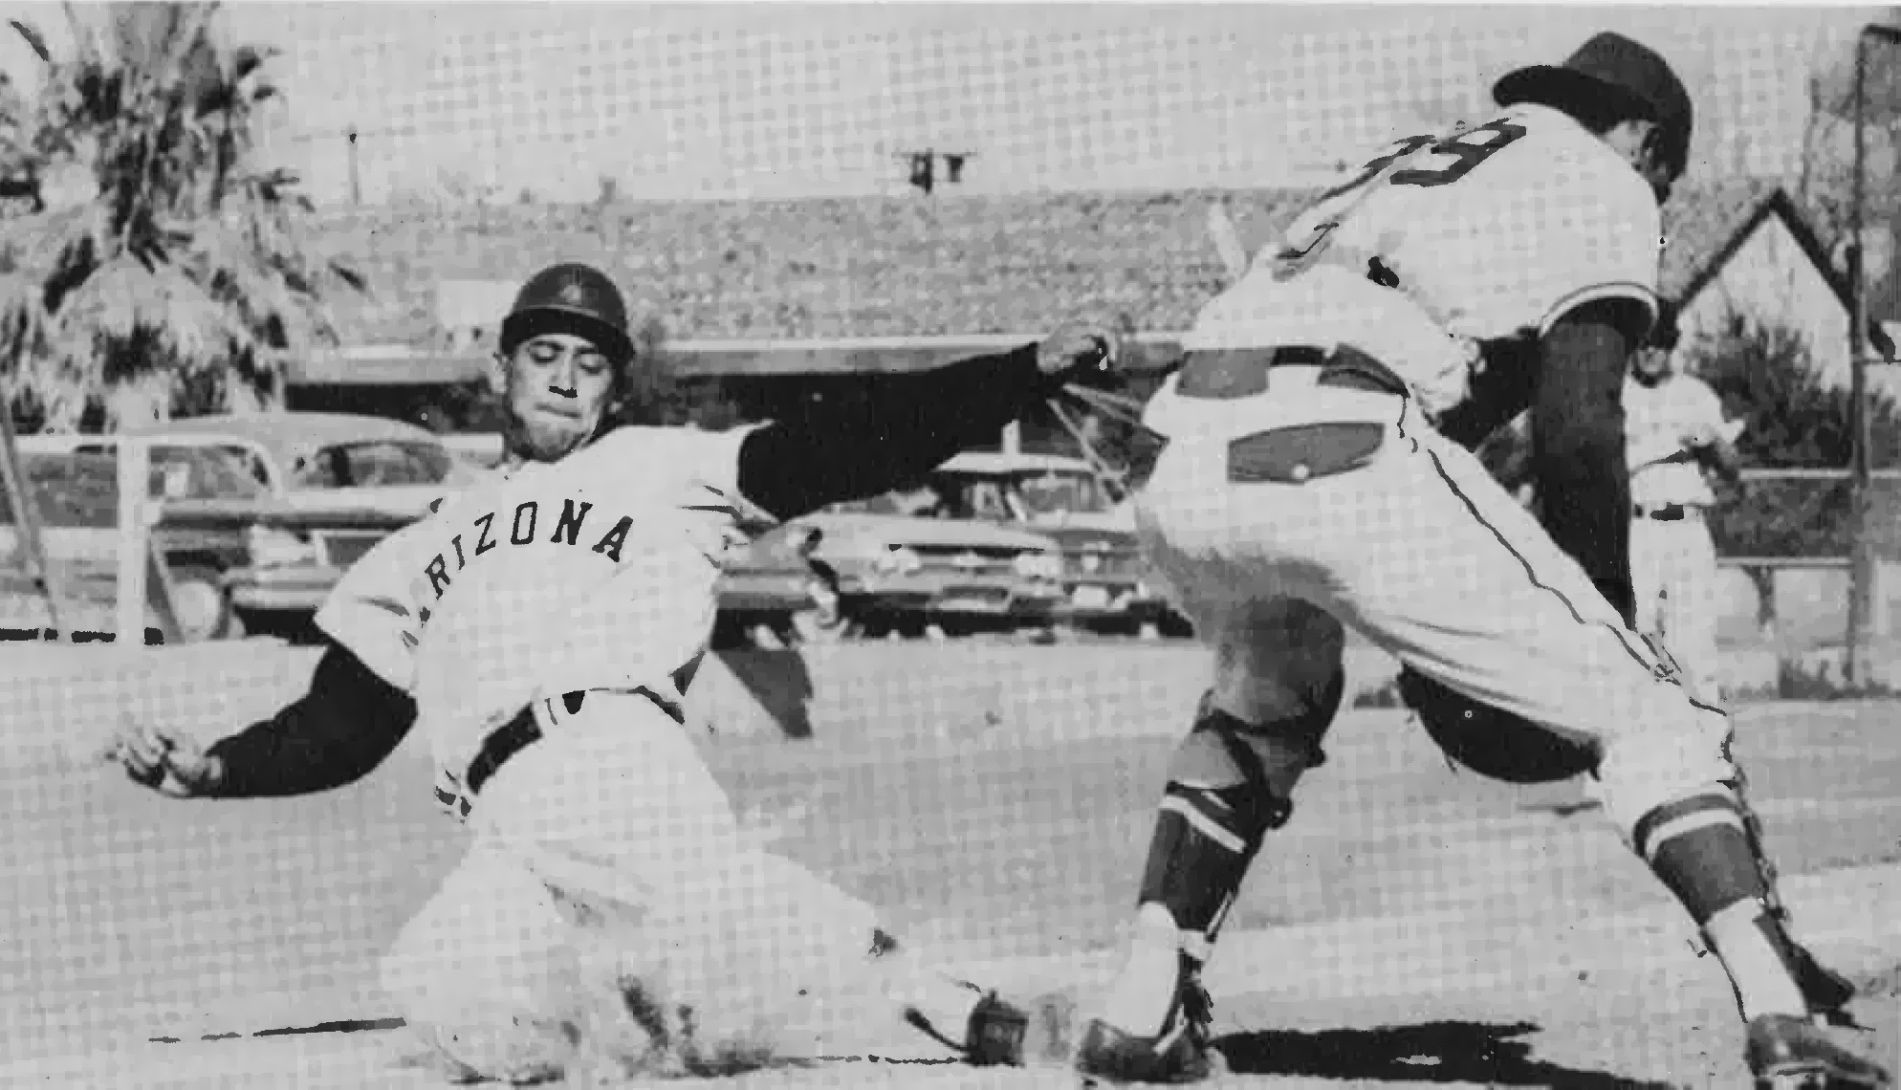 Professional Sale Rare 1939 Philadelphia Athletics Baseball Season Pass Full Ticket Connie Mack By Scientific Process Sports Mem, Cards & Fan Shop